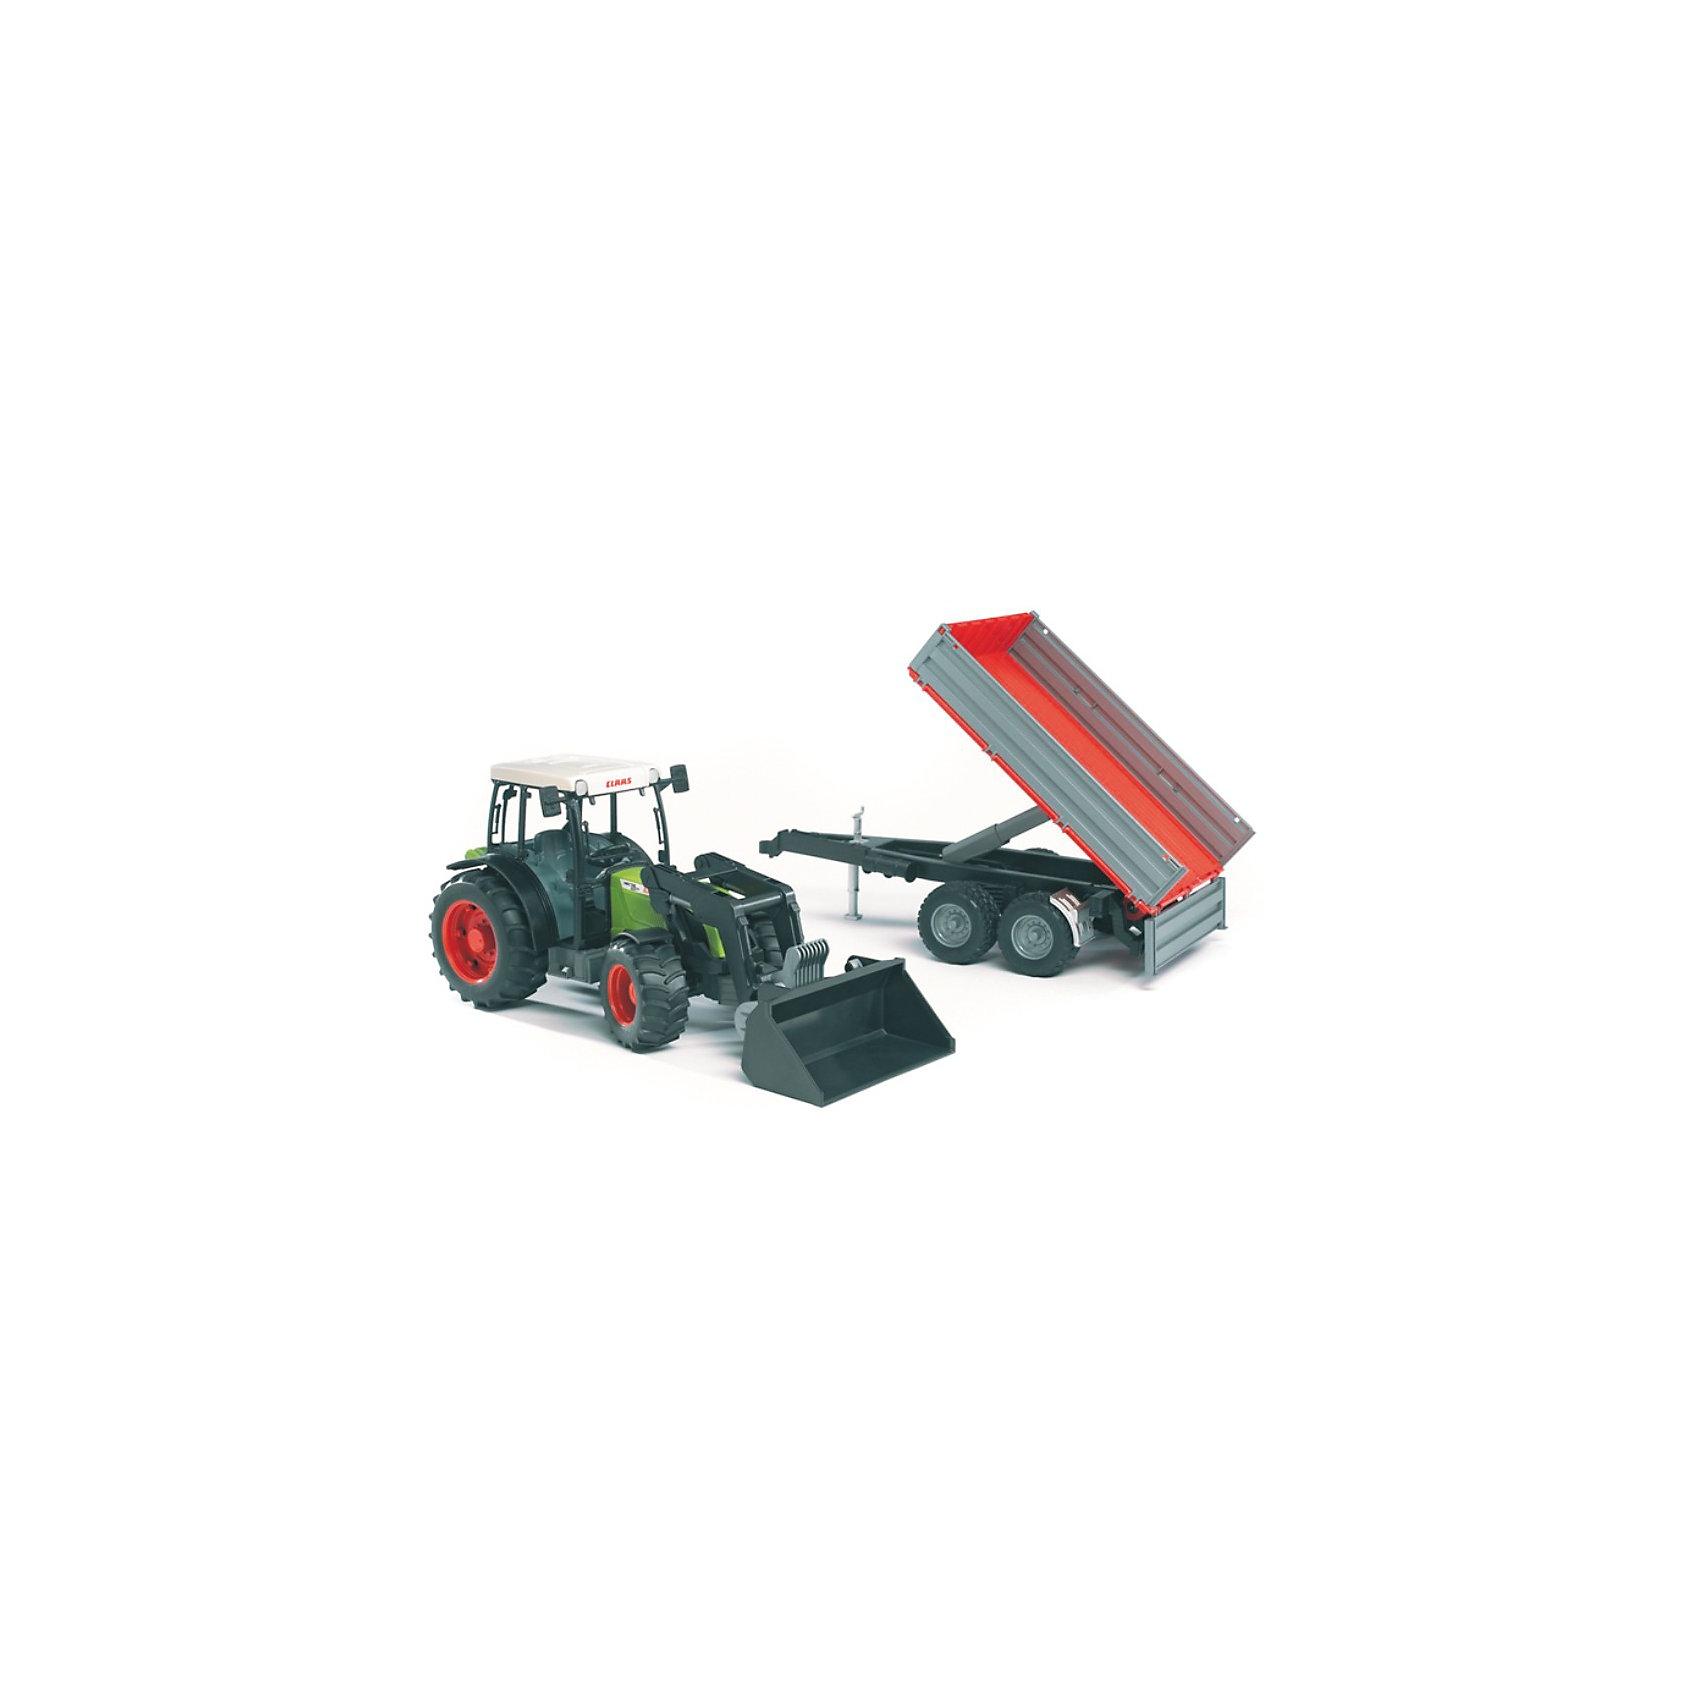 Bruder Трактор Claas Nectis с погрузчиком и прицепом, Bruder машины bruder трактор claas nectis 267 f с погрузчиком и прицепом